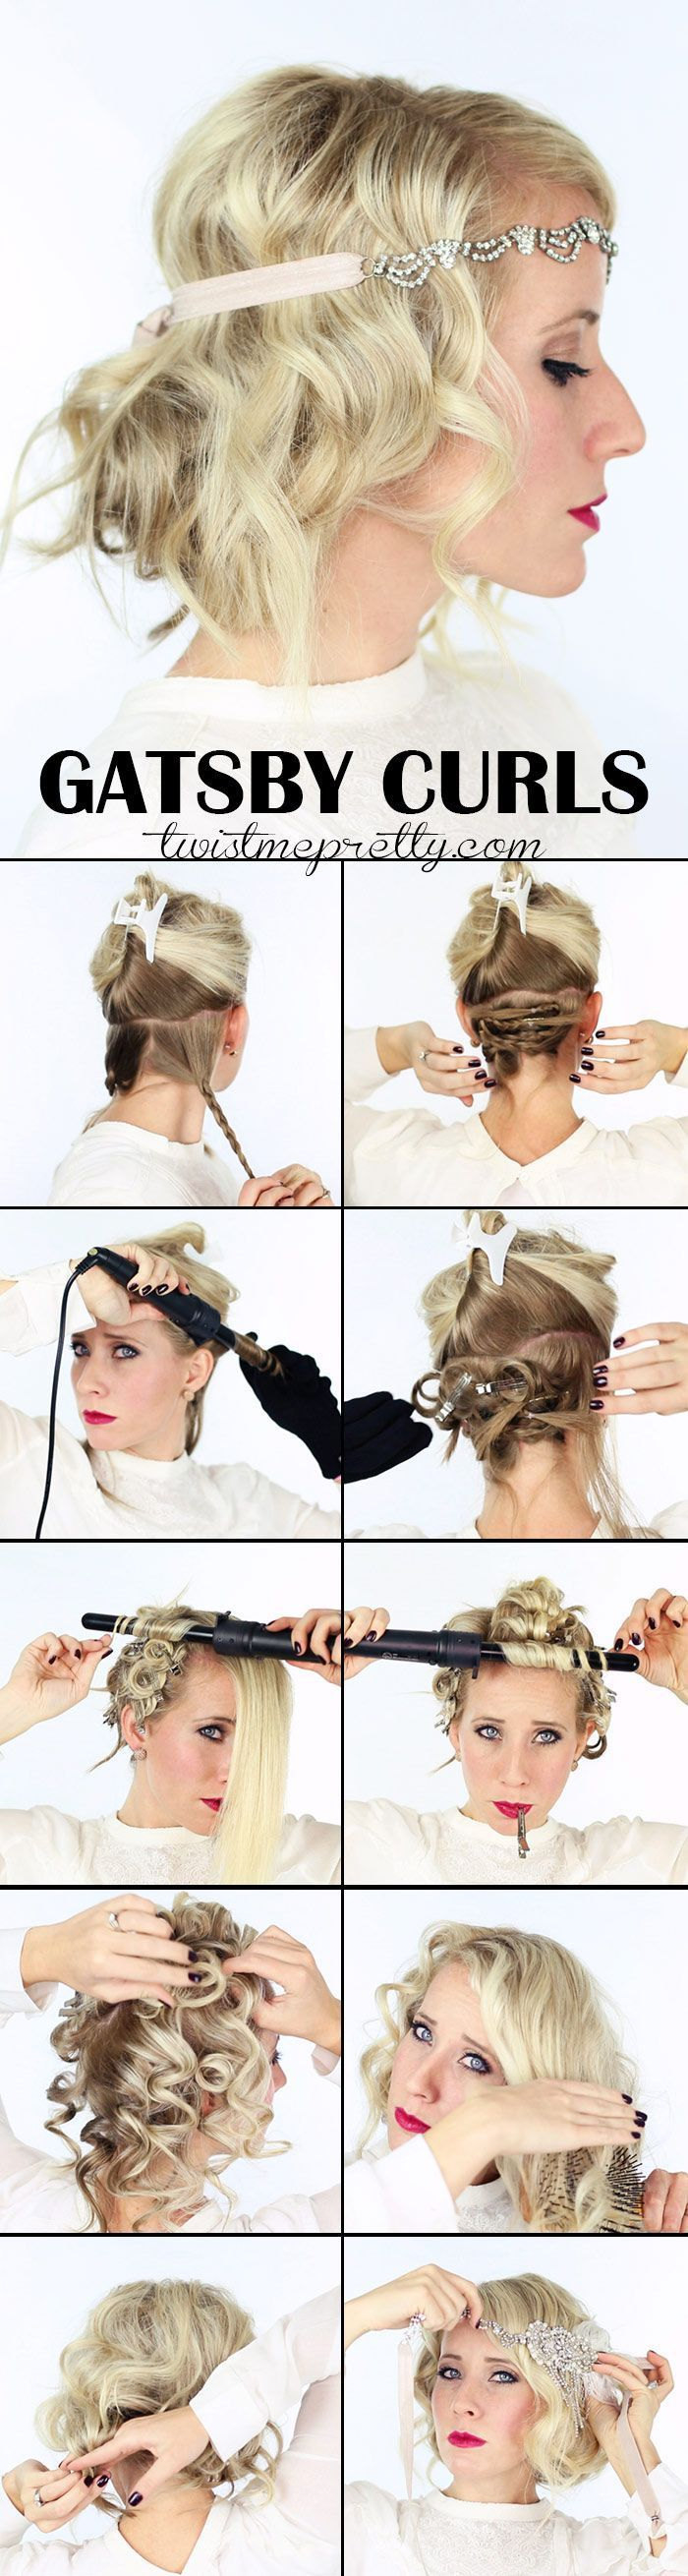 Tutorials: 12 Super Easy DIY Wedding Hairstyles | Flapper girl ...